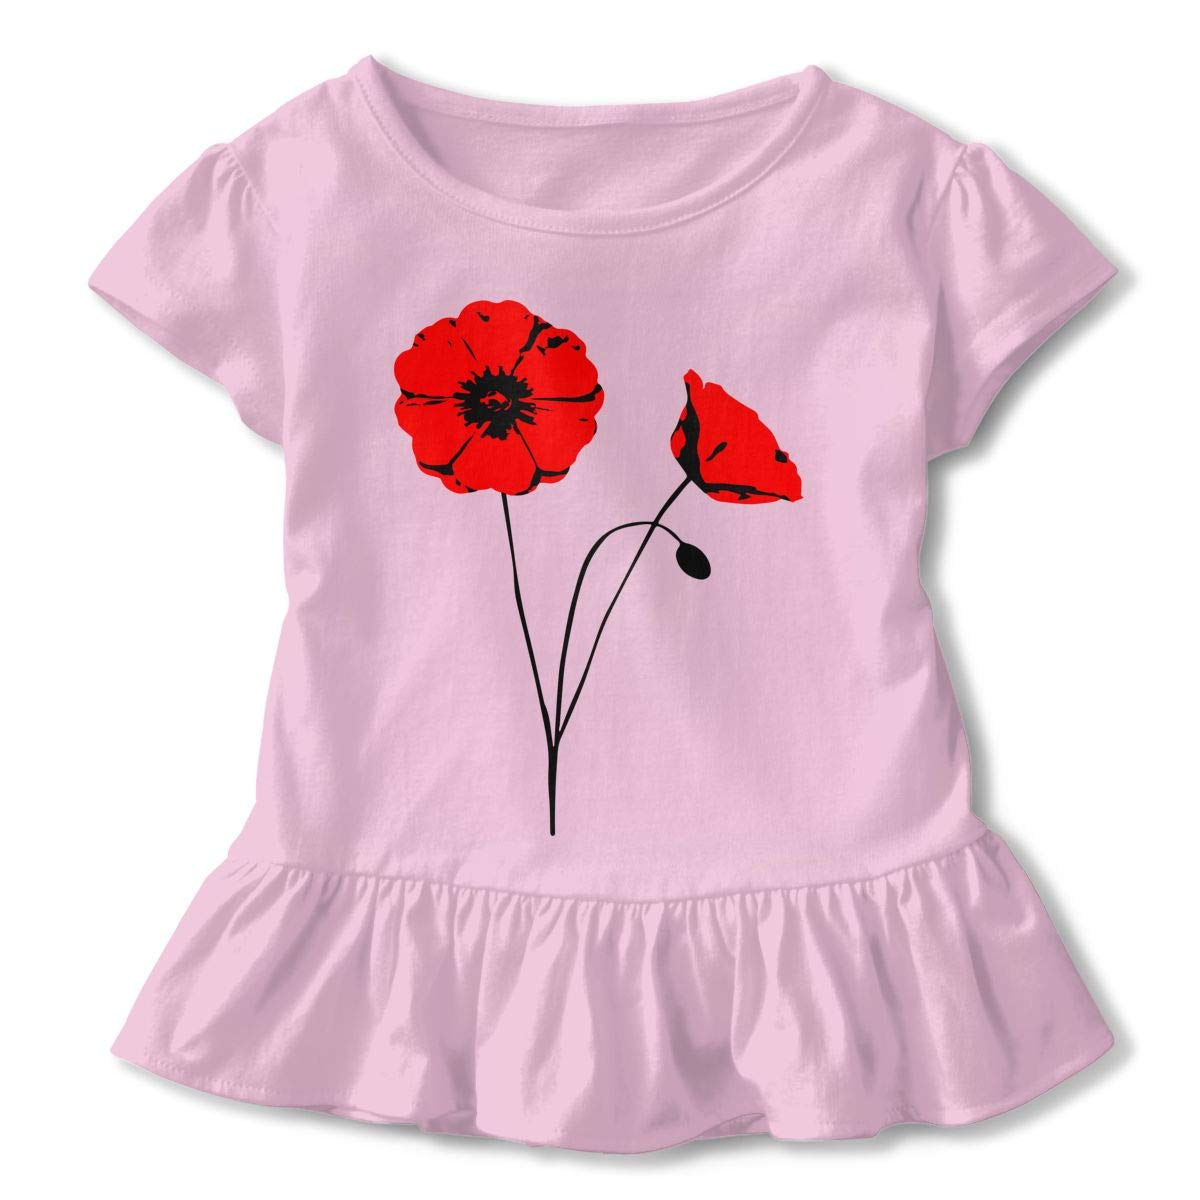 SHIRT1-KIDS Poppy Flower T-Shirts Toddler//Infant Girls Short Sleeve Ruffles Shirt T-Shirt for 2-6T